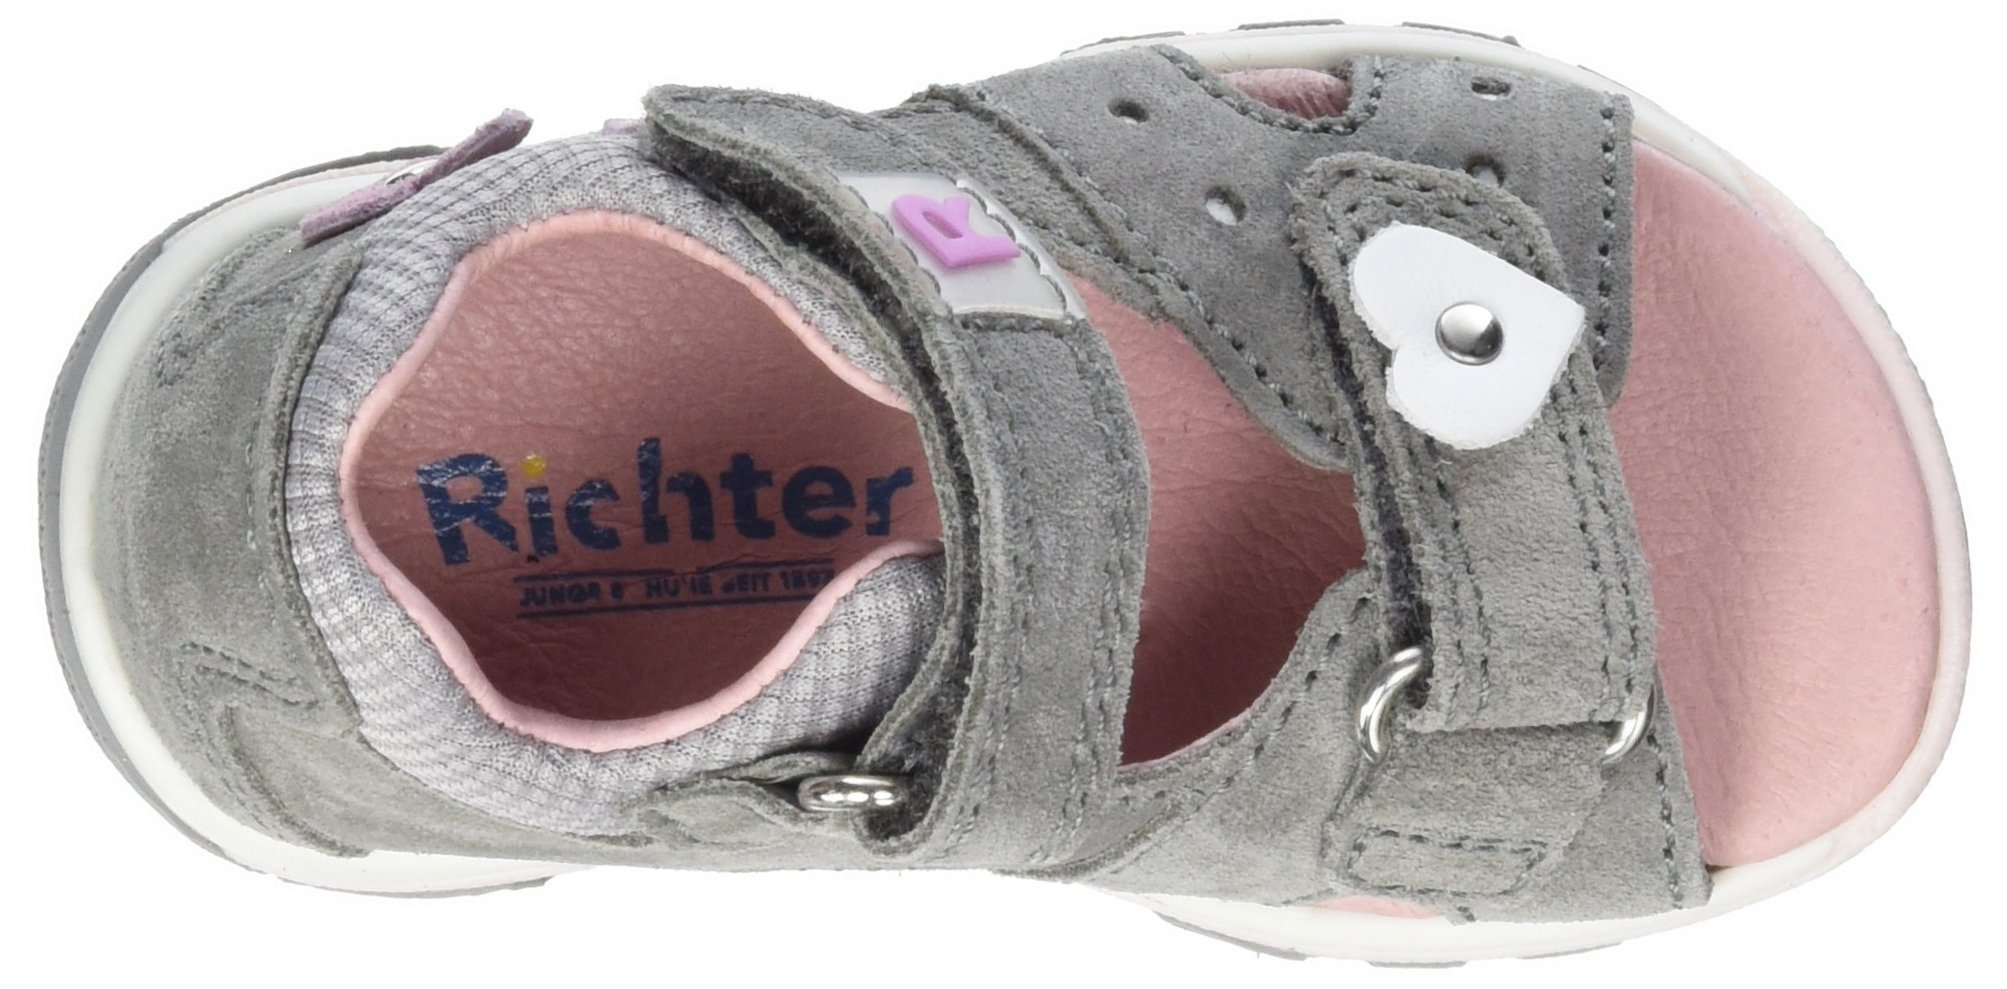 Wie Fallen Naturino Schuhe Aus